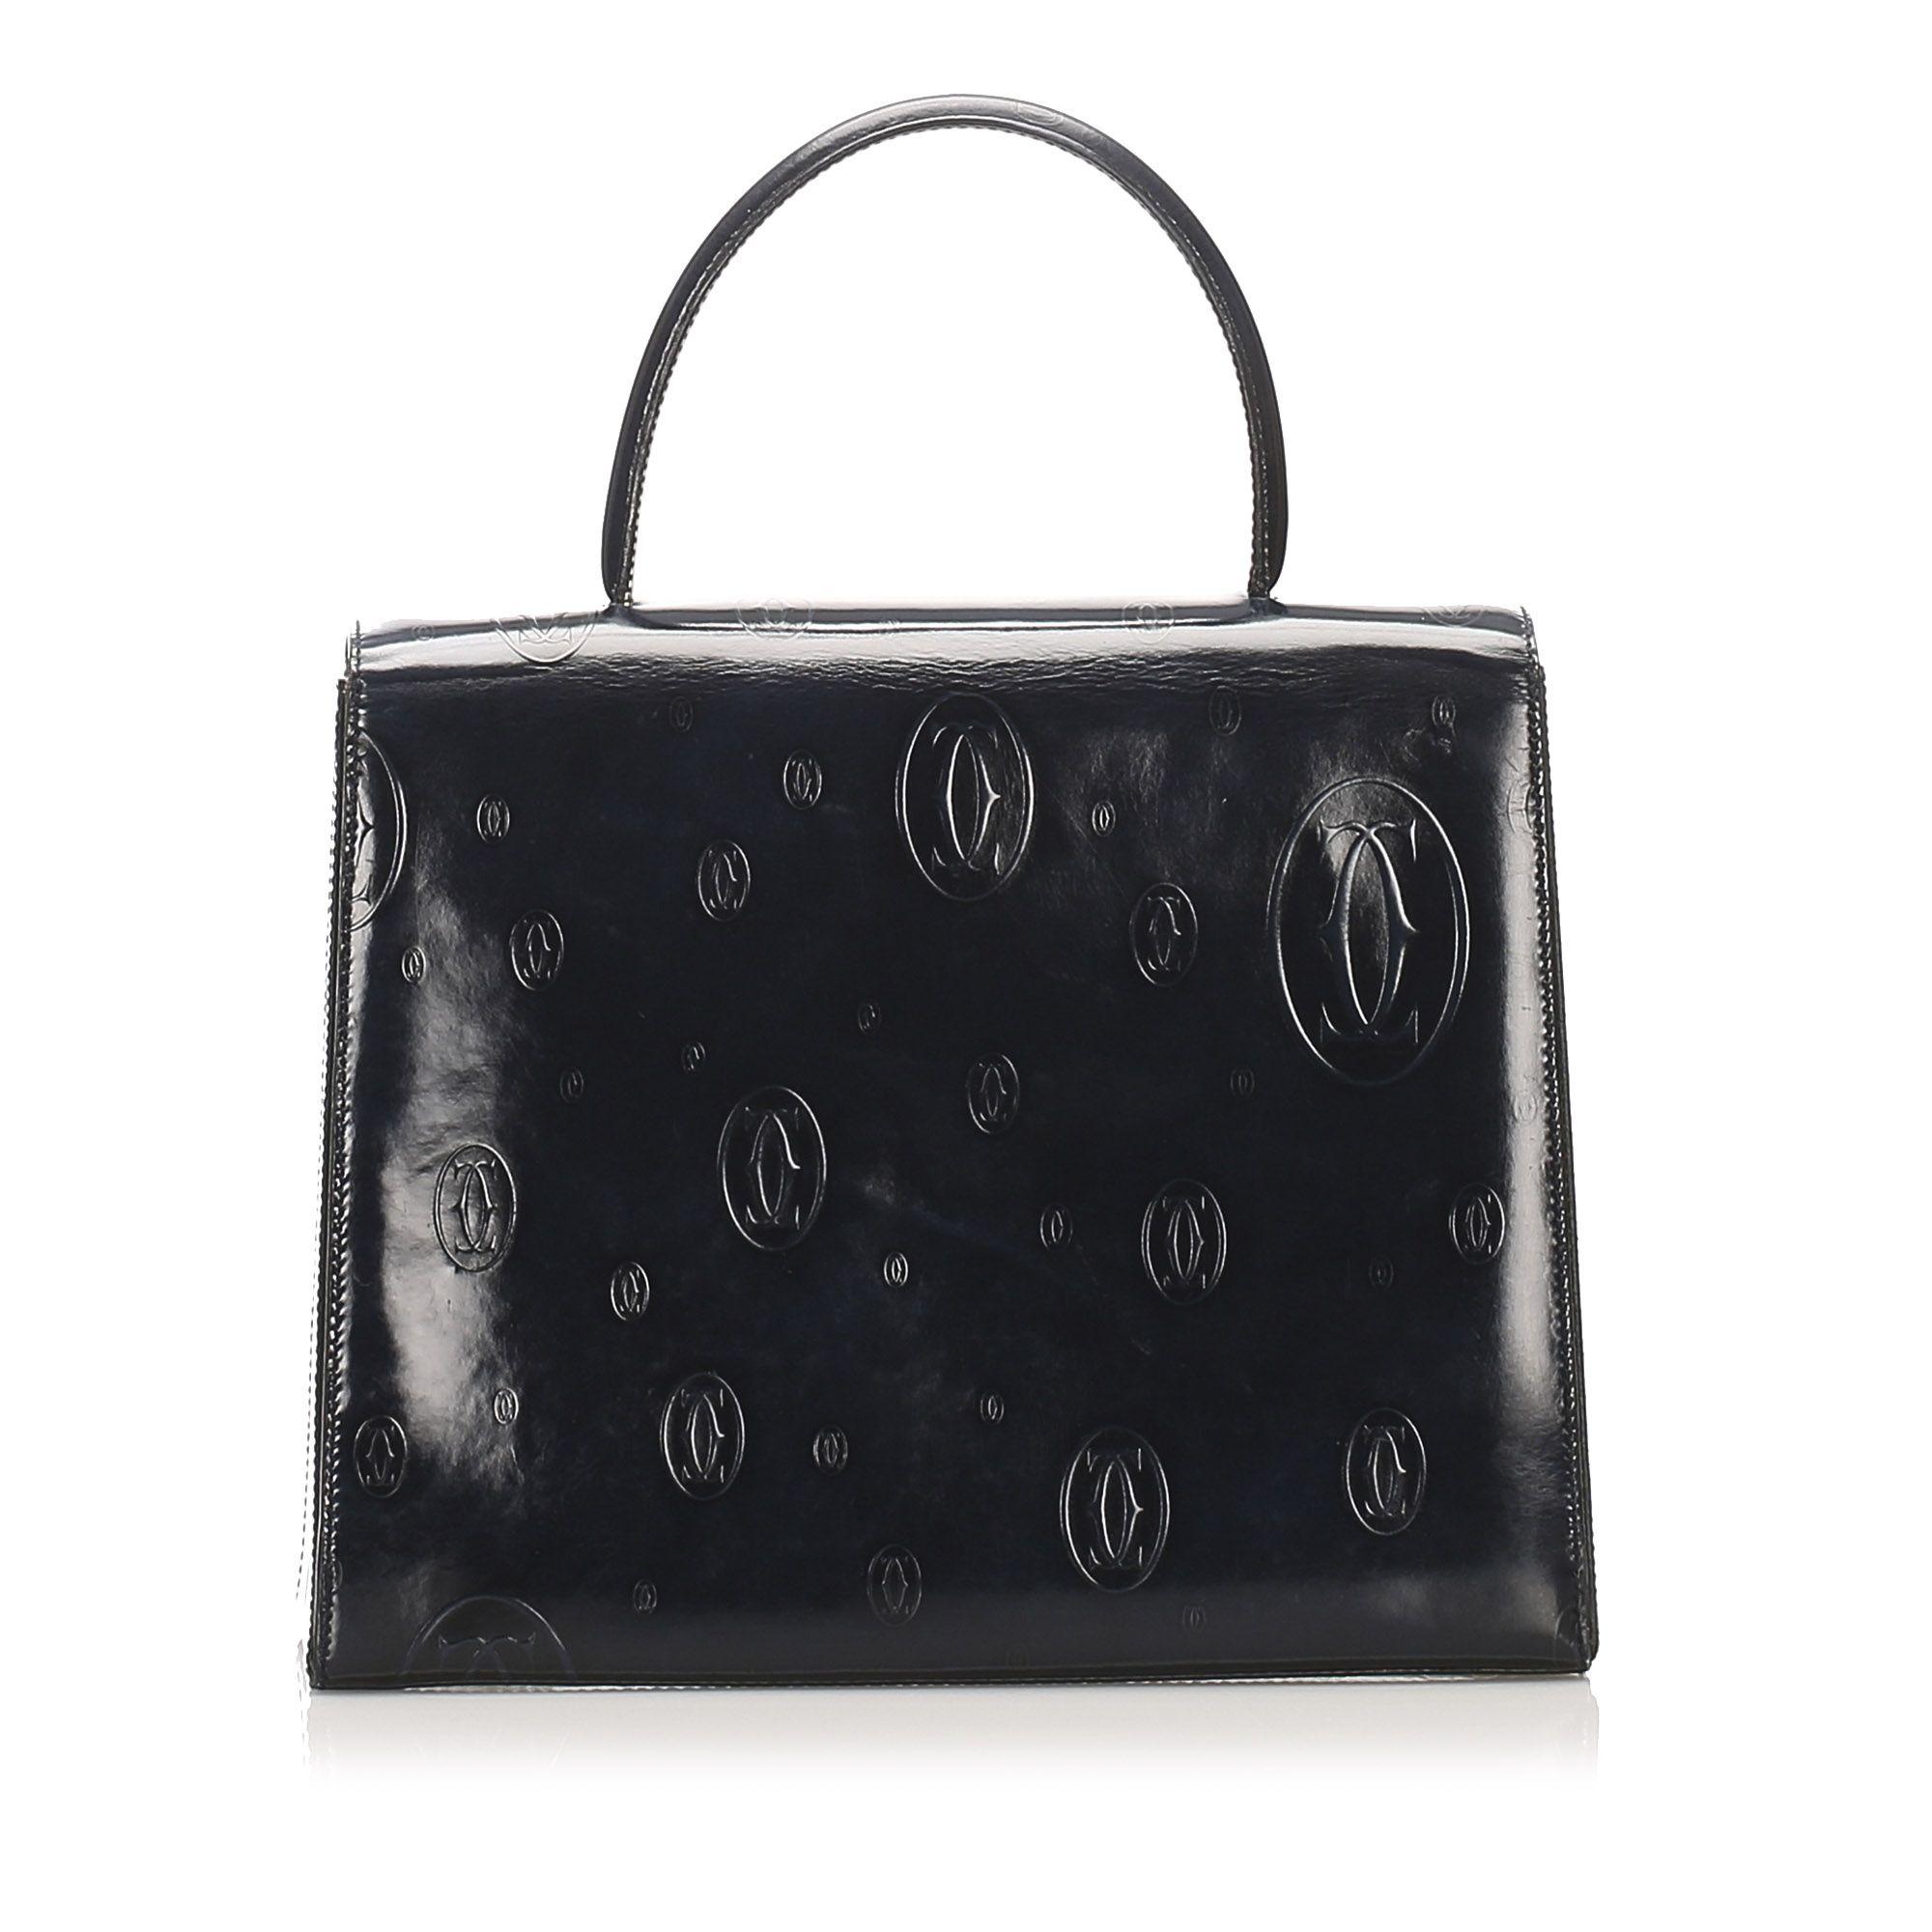 Vintage Cartier Happy Birthday Patent Leather Handbag Black